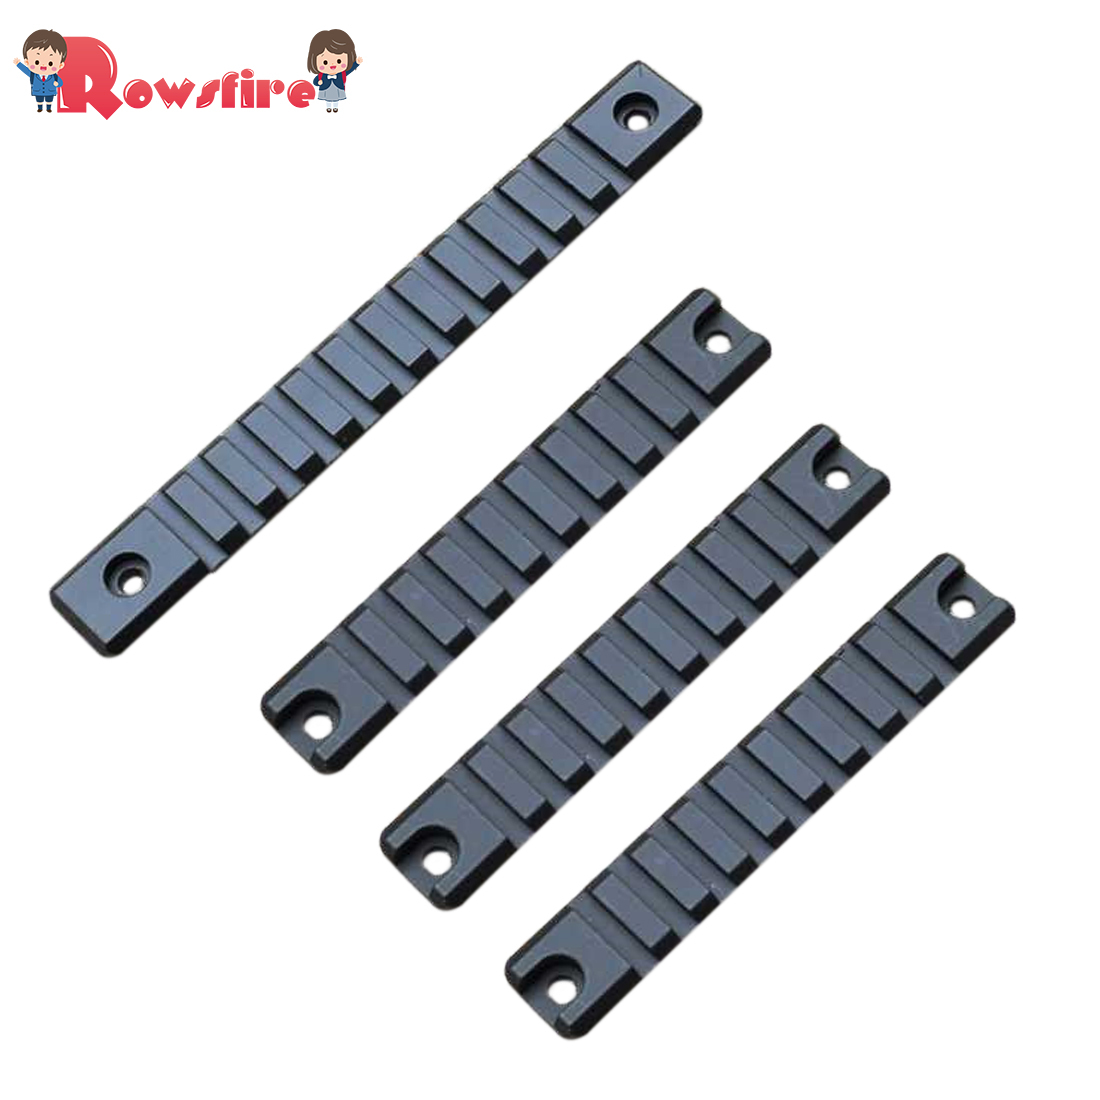 Metal Guide Rail For HFL UMP45 Water Gel Beads Blaster - Black